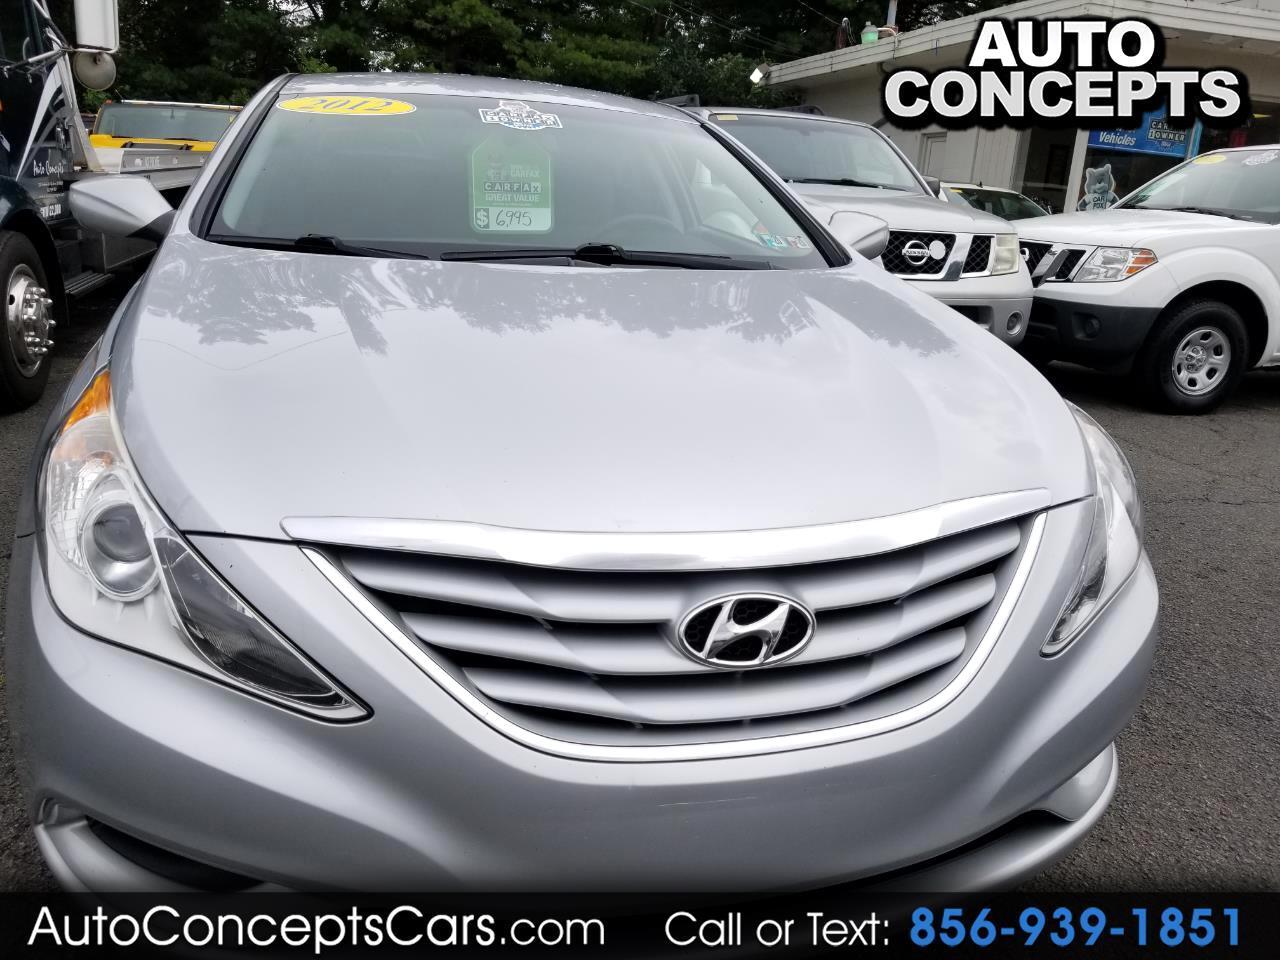 2012 Hyundai Sonata GLS Auto